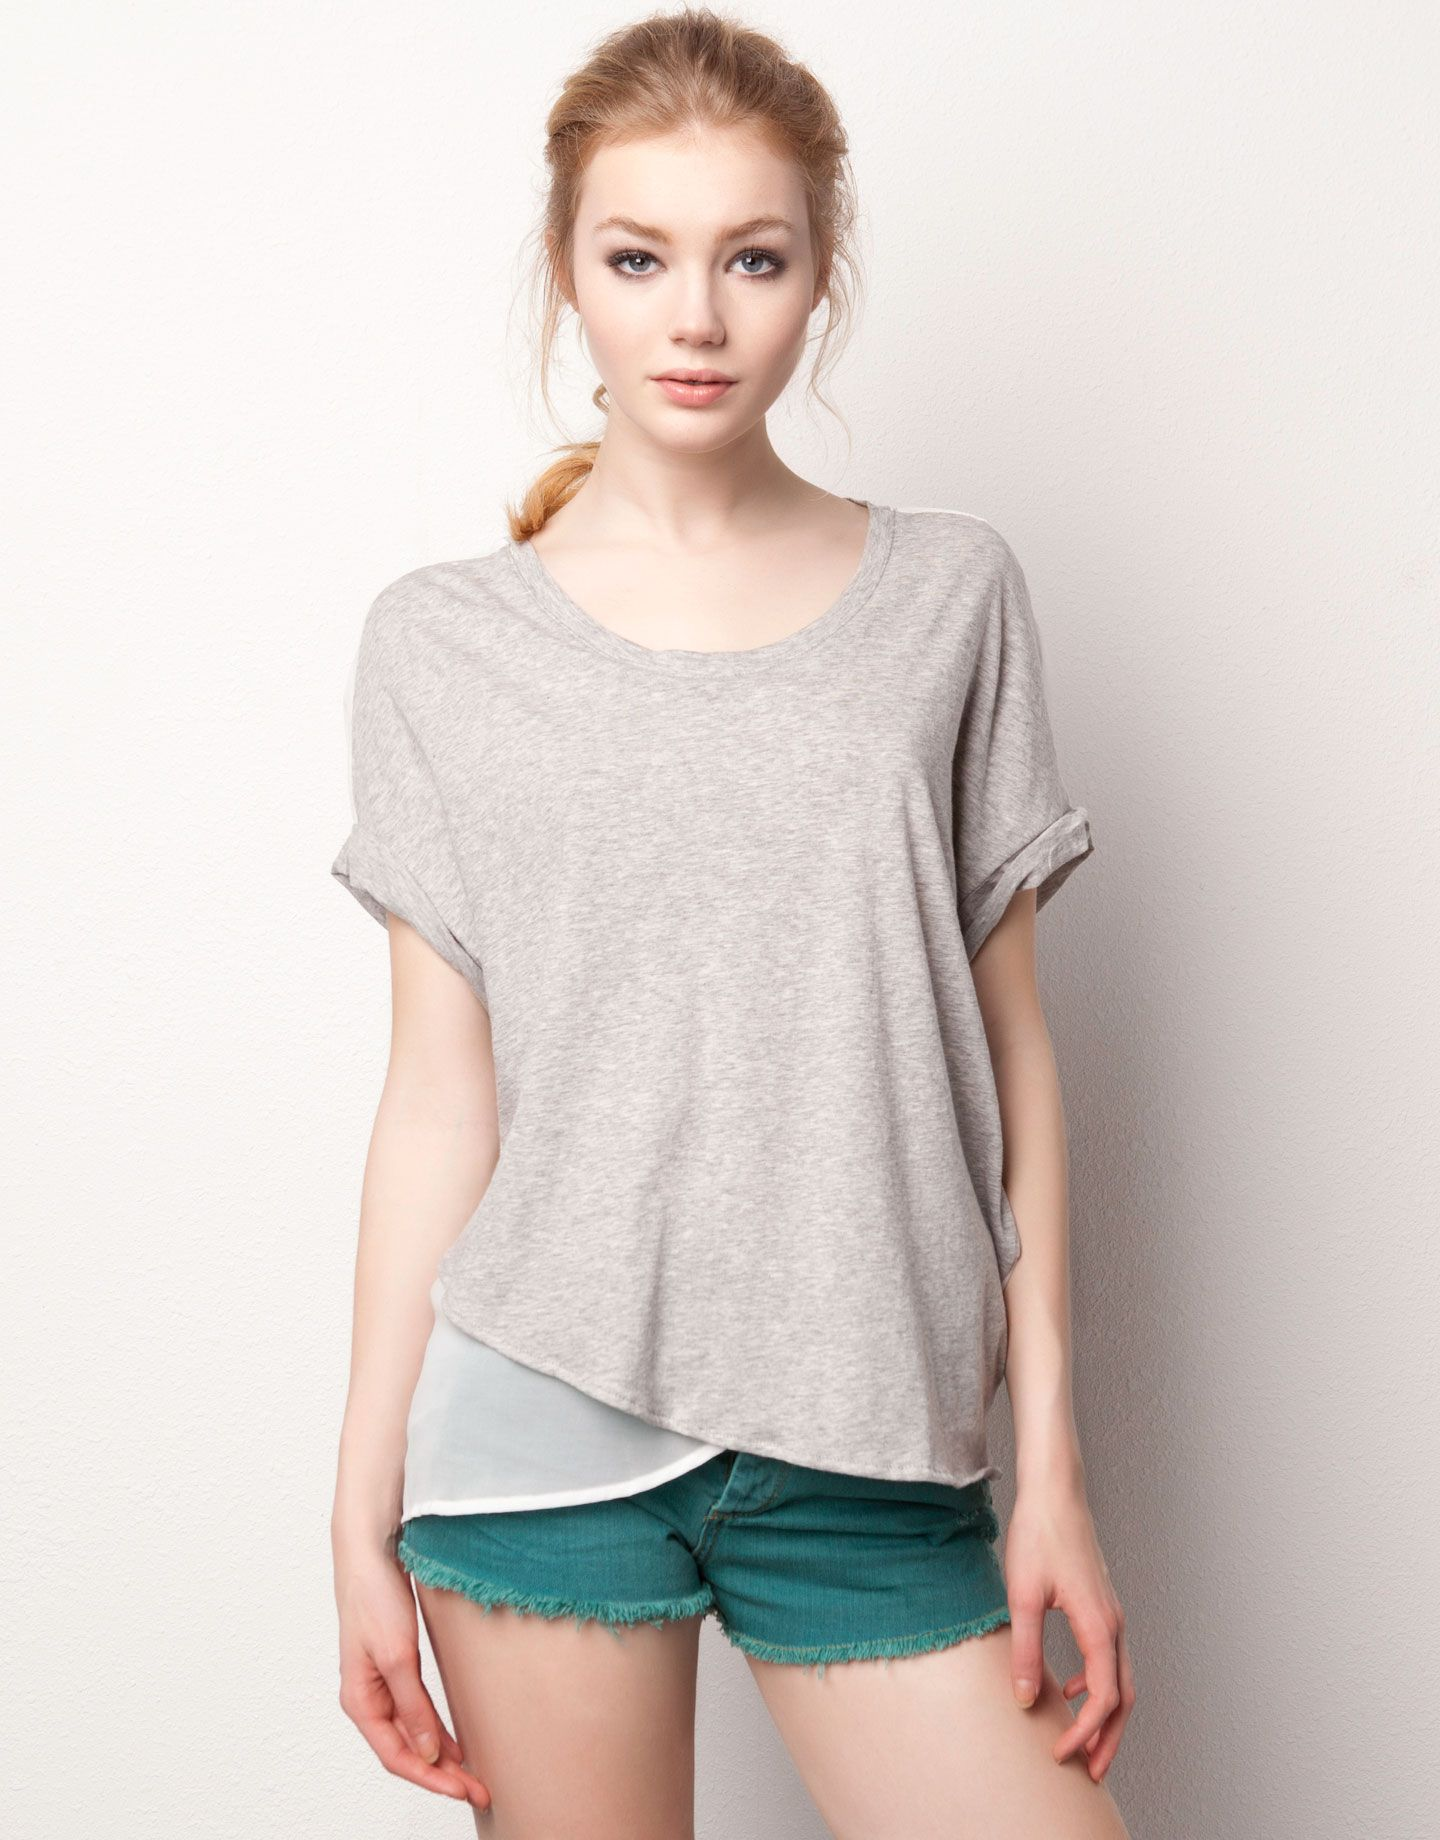 Pin de Maria Belen en costura | Pinterest | Blusas y Costura